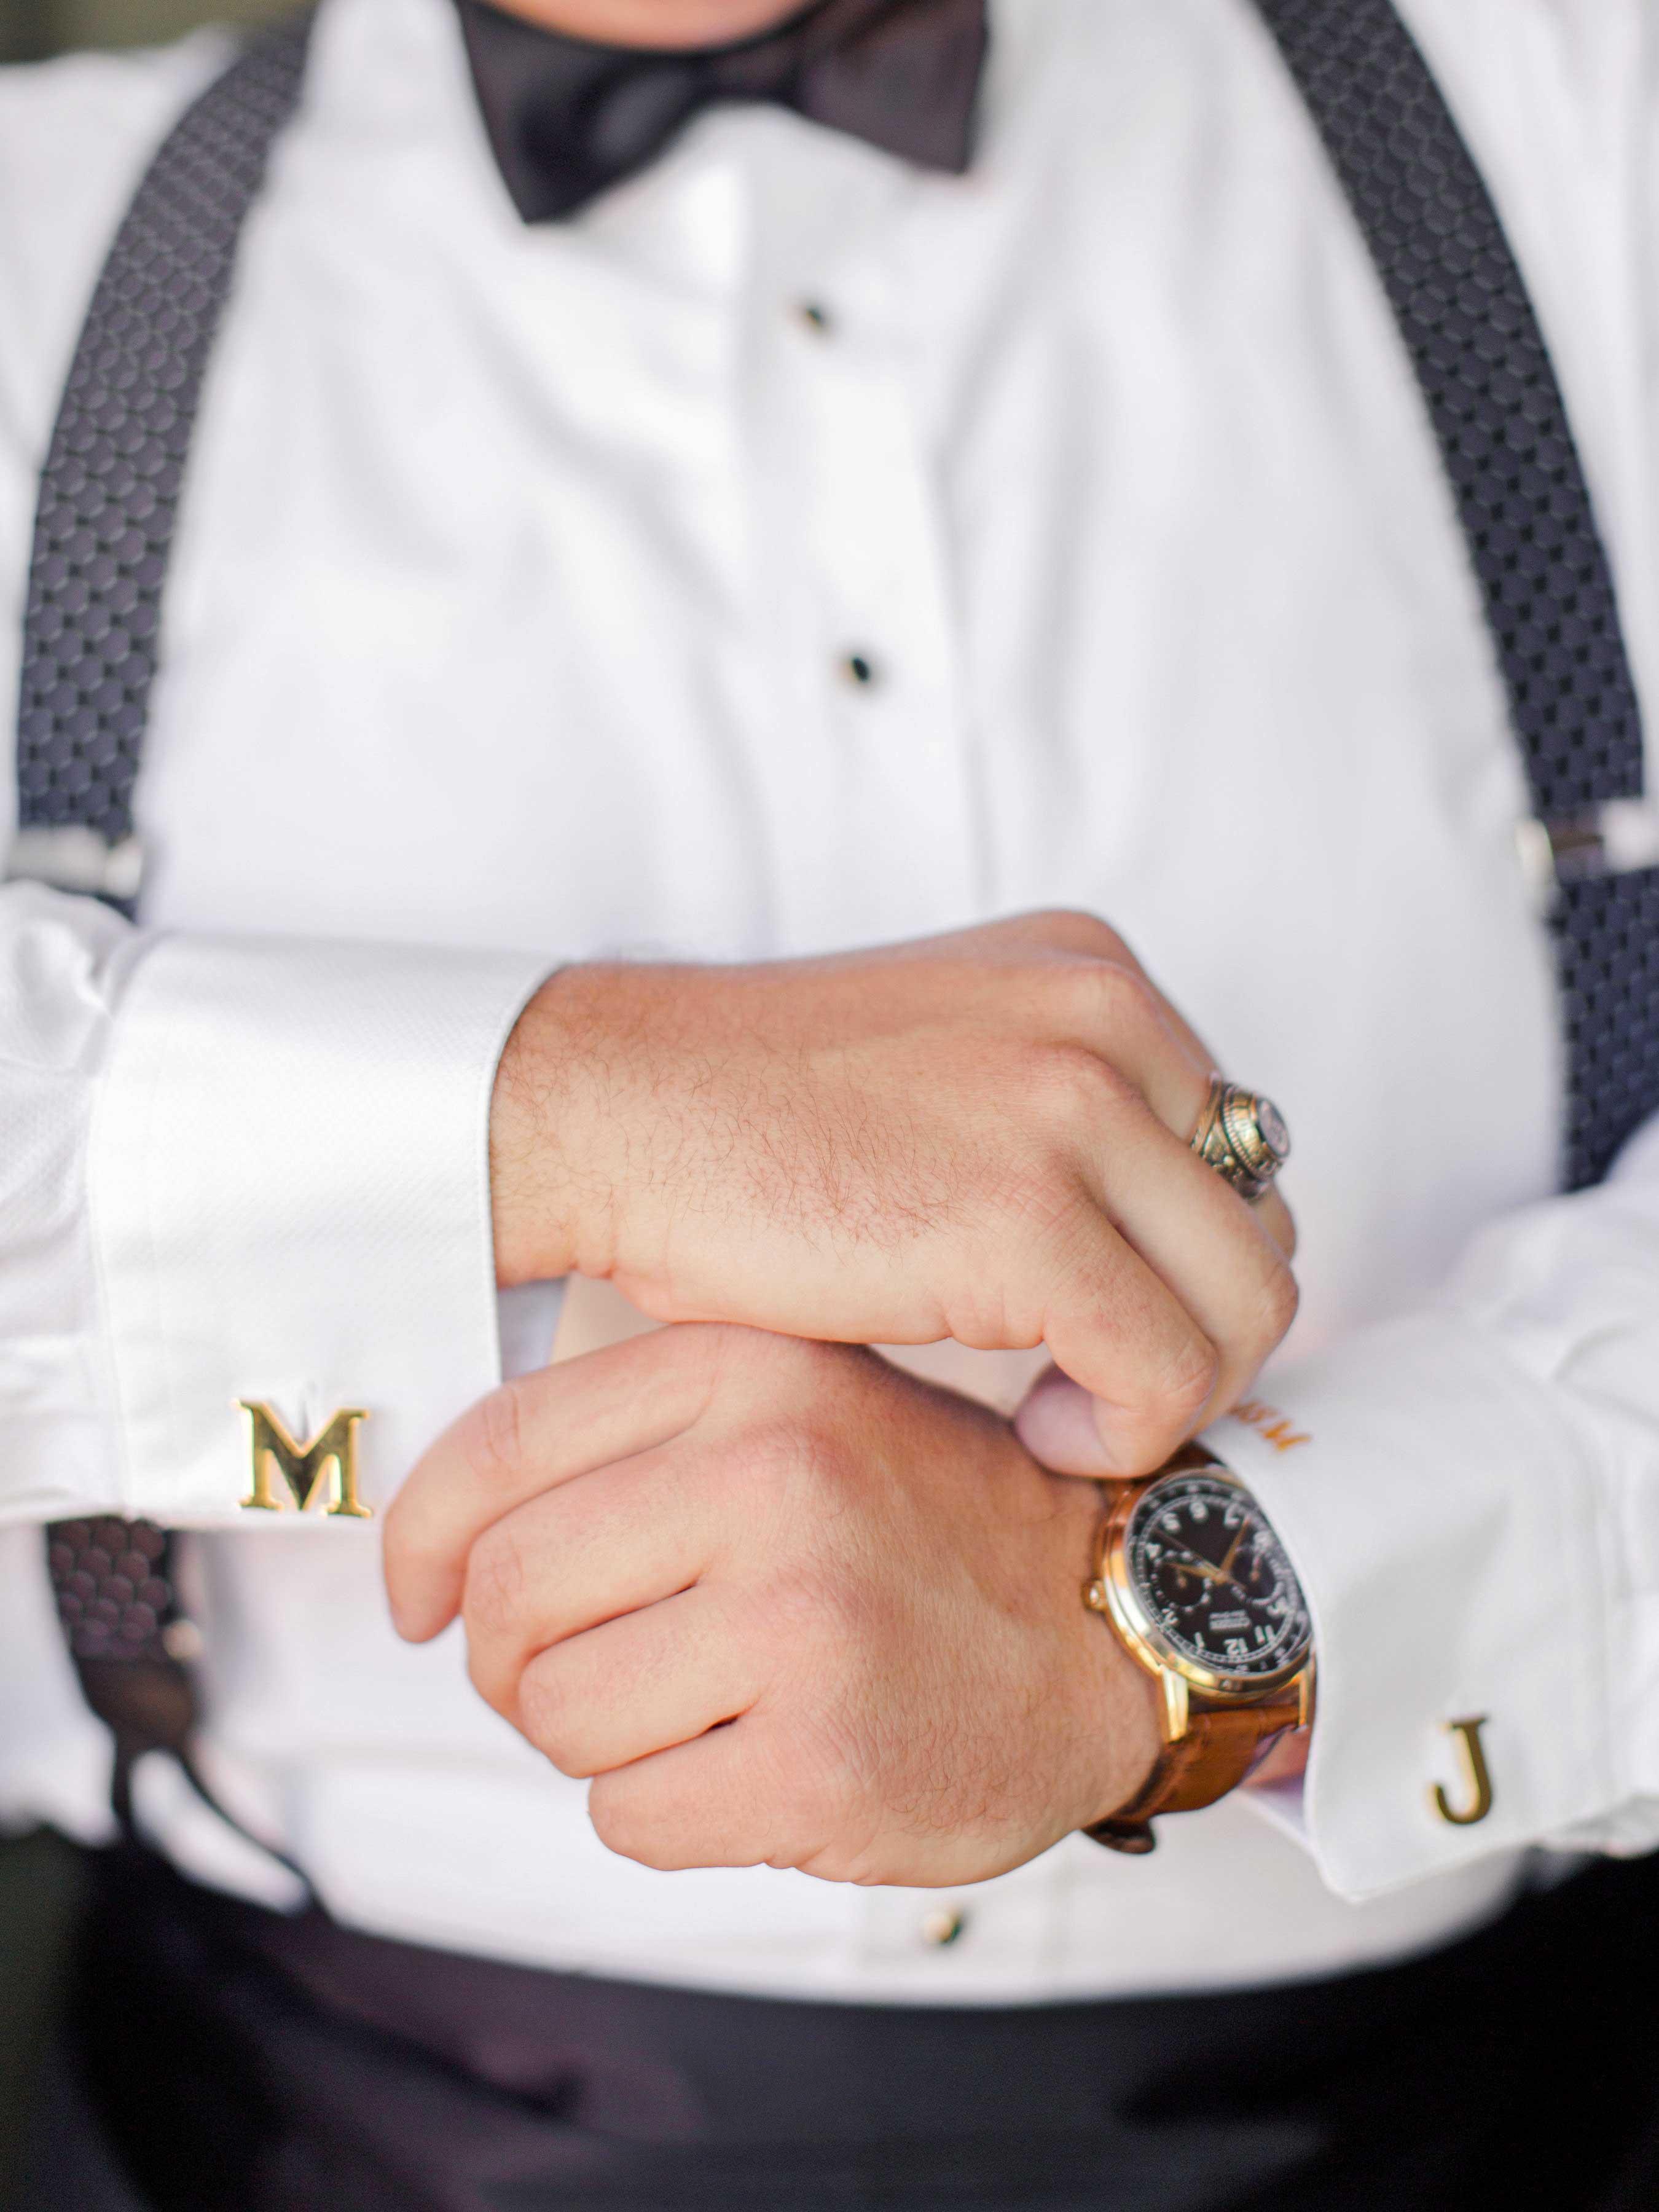 carey jared wedding cufflinks